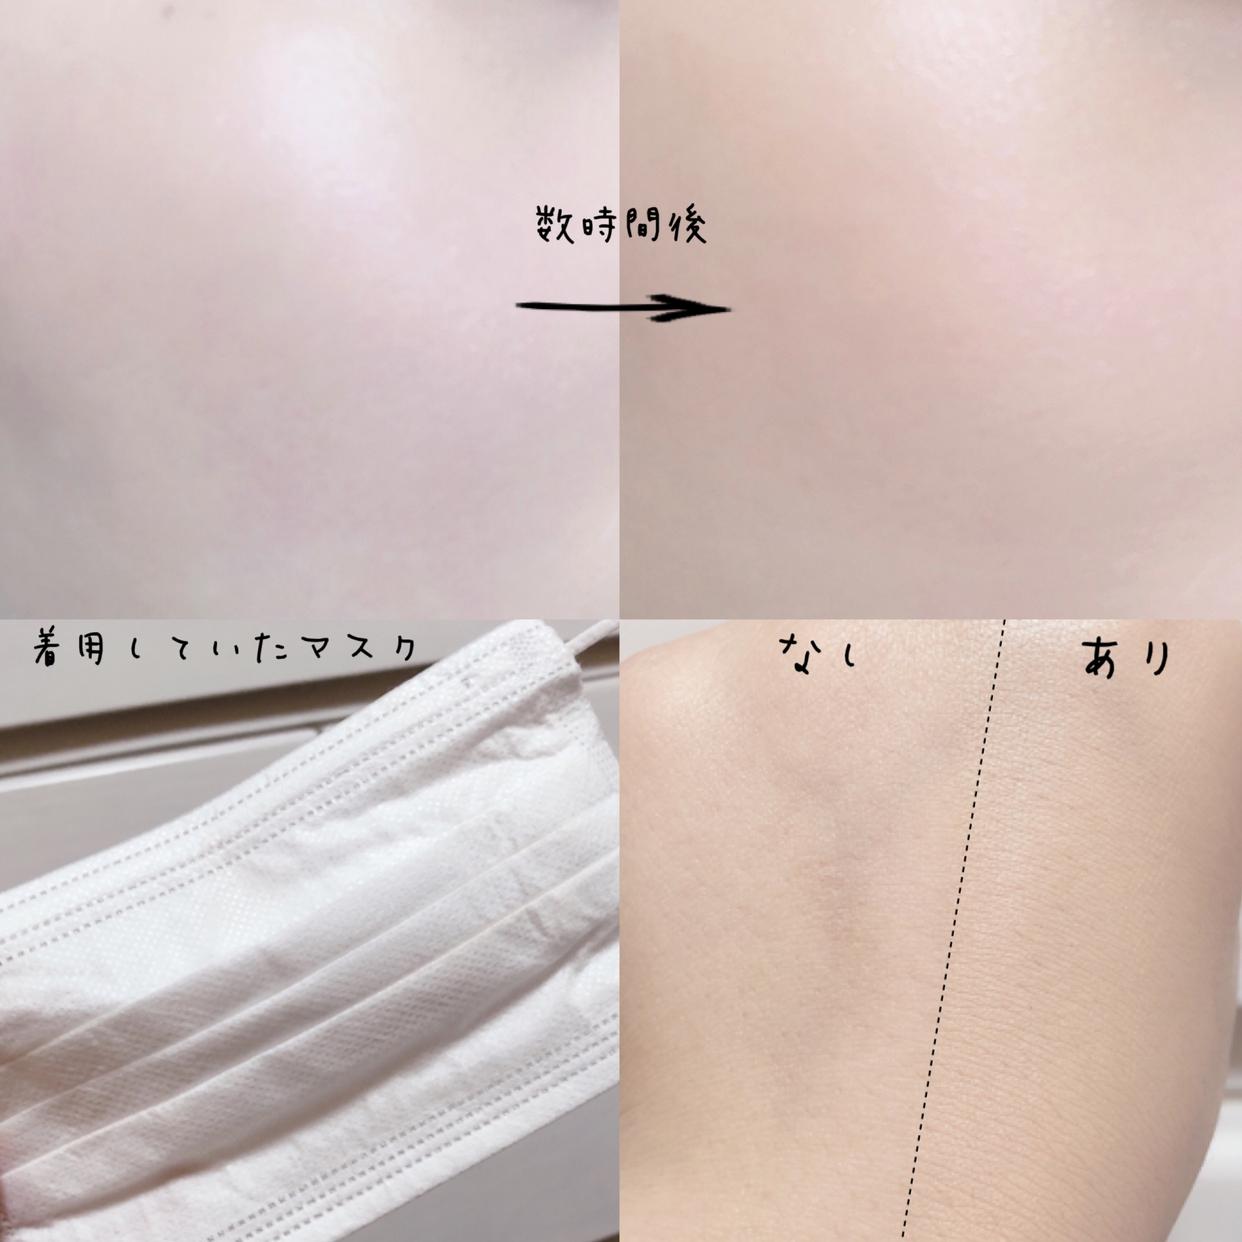 APLIN(アプリン)ピンクティーツリーカバークッションを使った桜羽さんのクチコミ画像